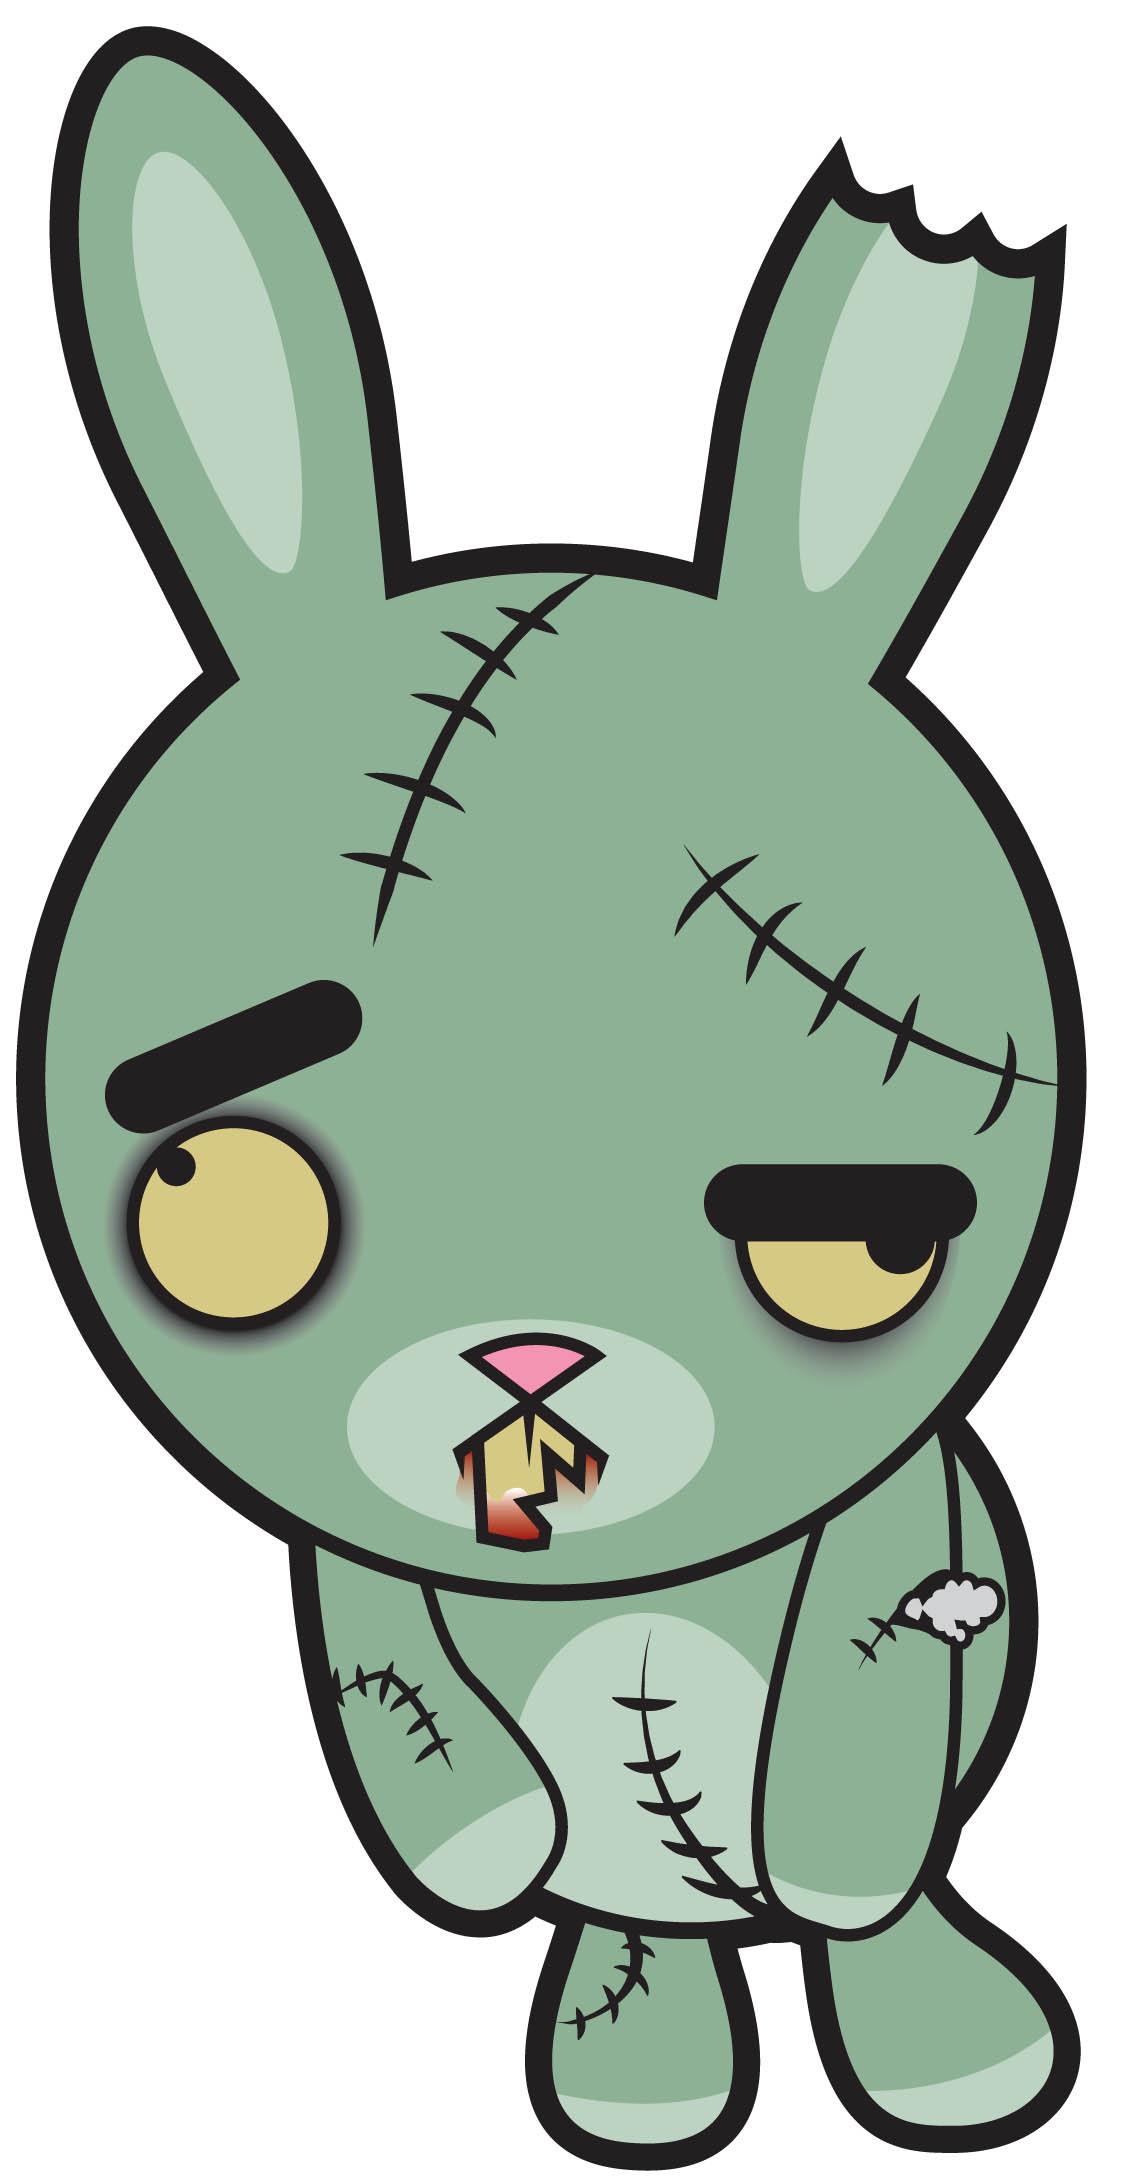 Scary clipart bunny #11